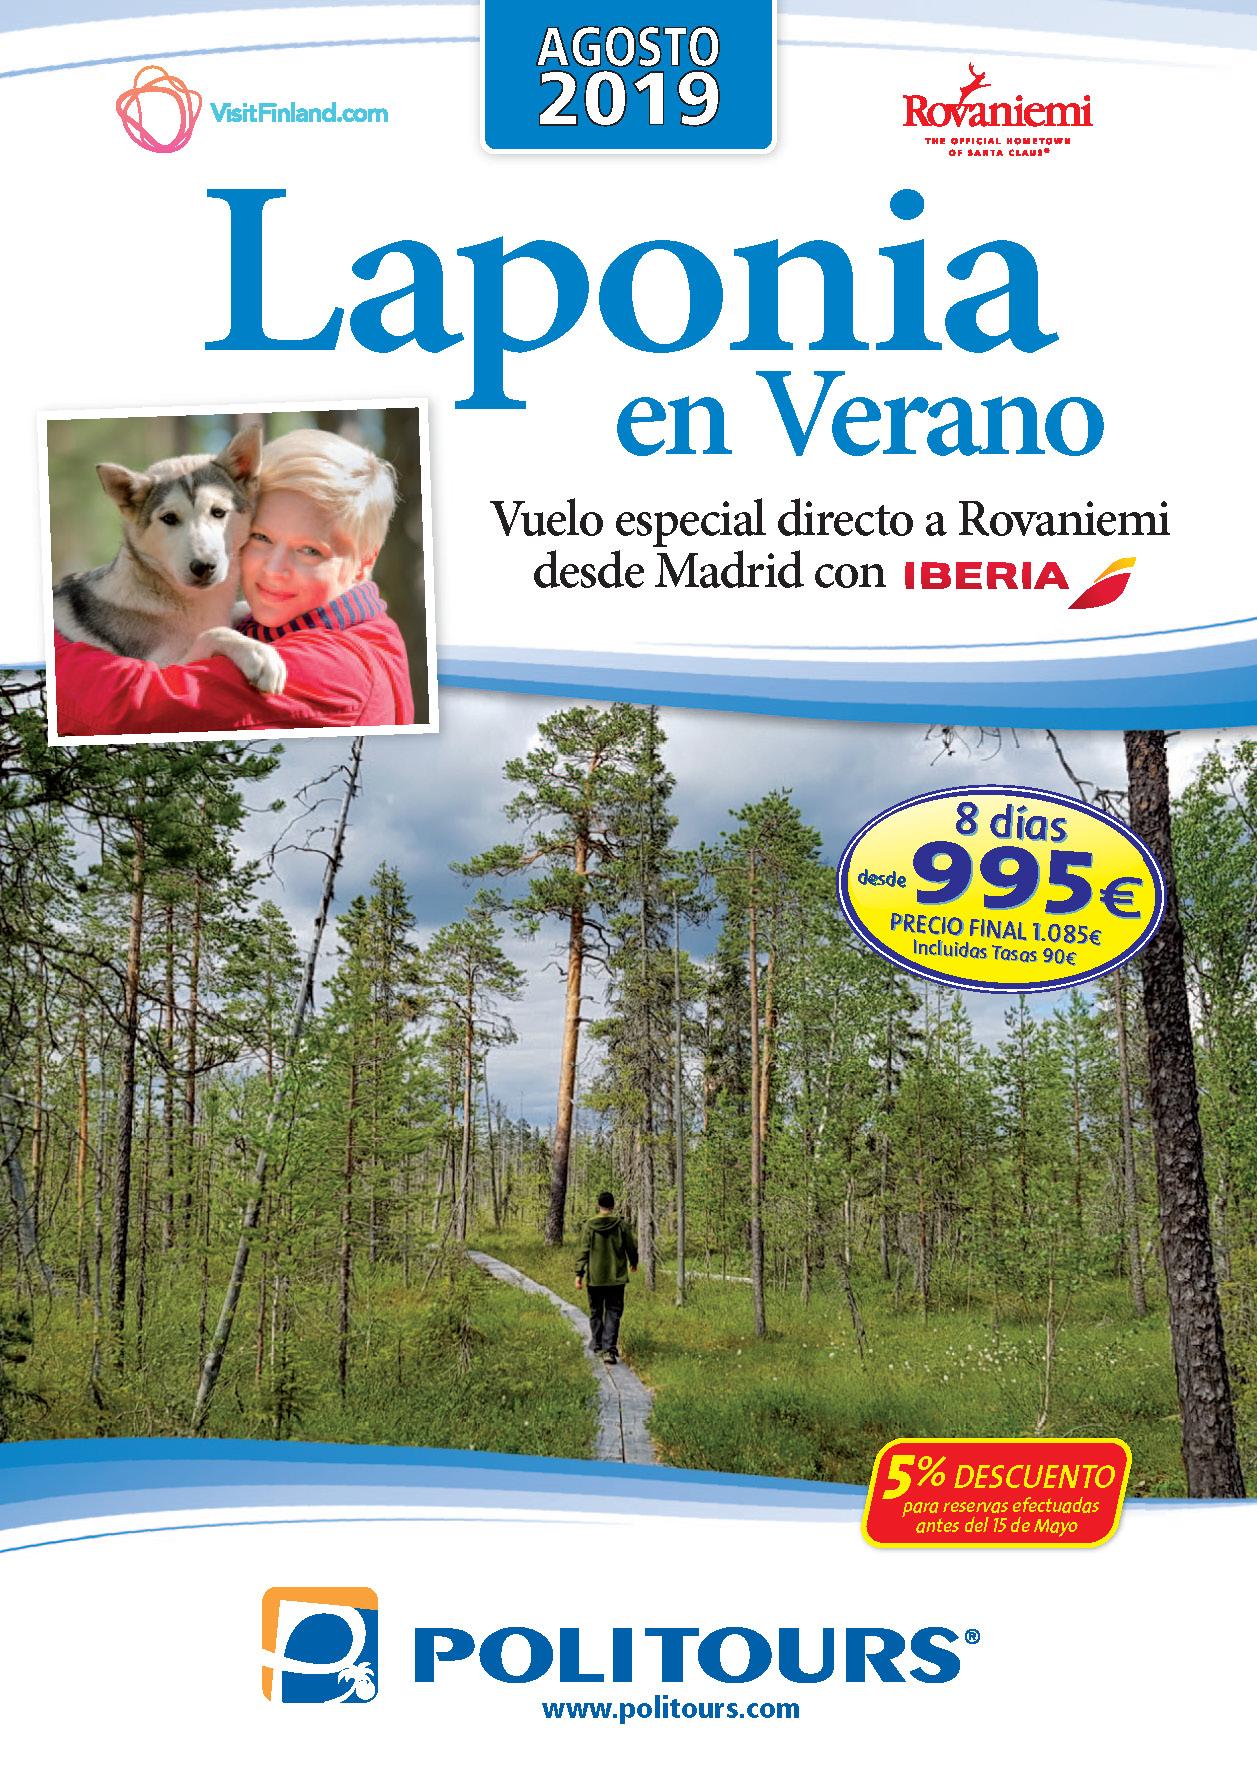 Catalogo Politours Laponia Verano 2019